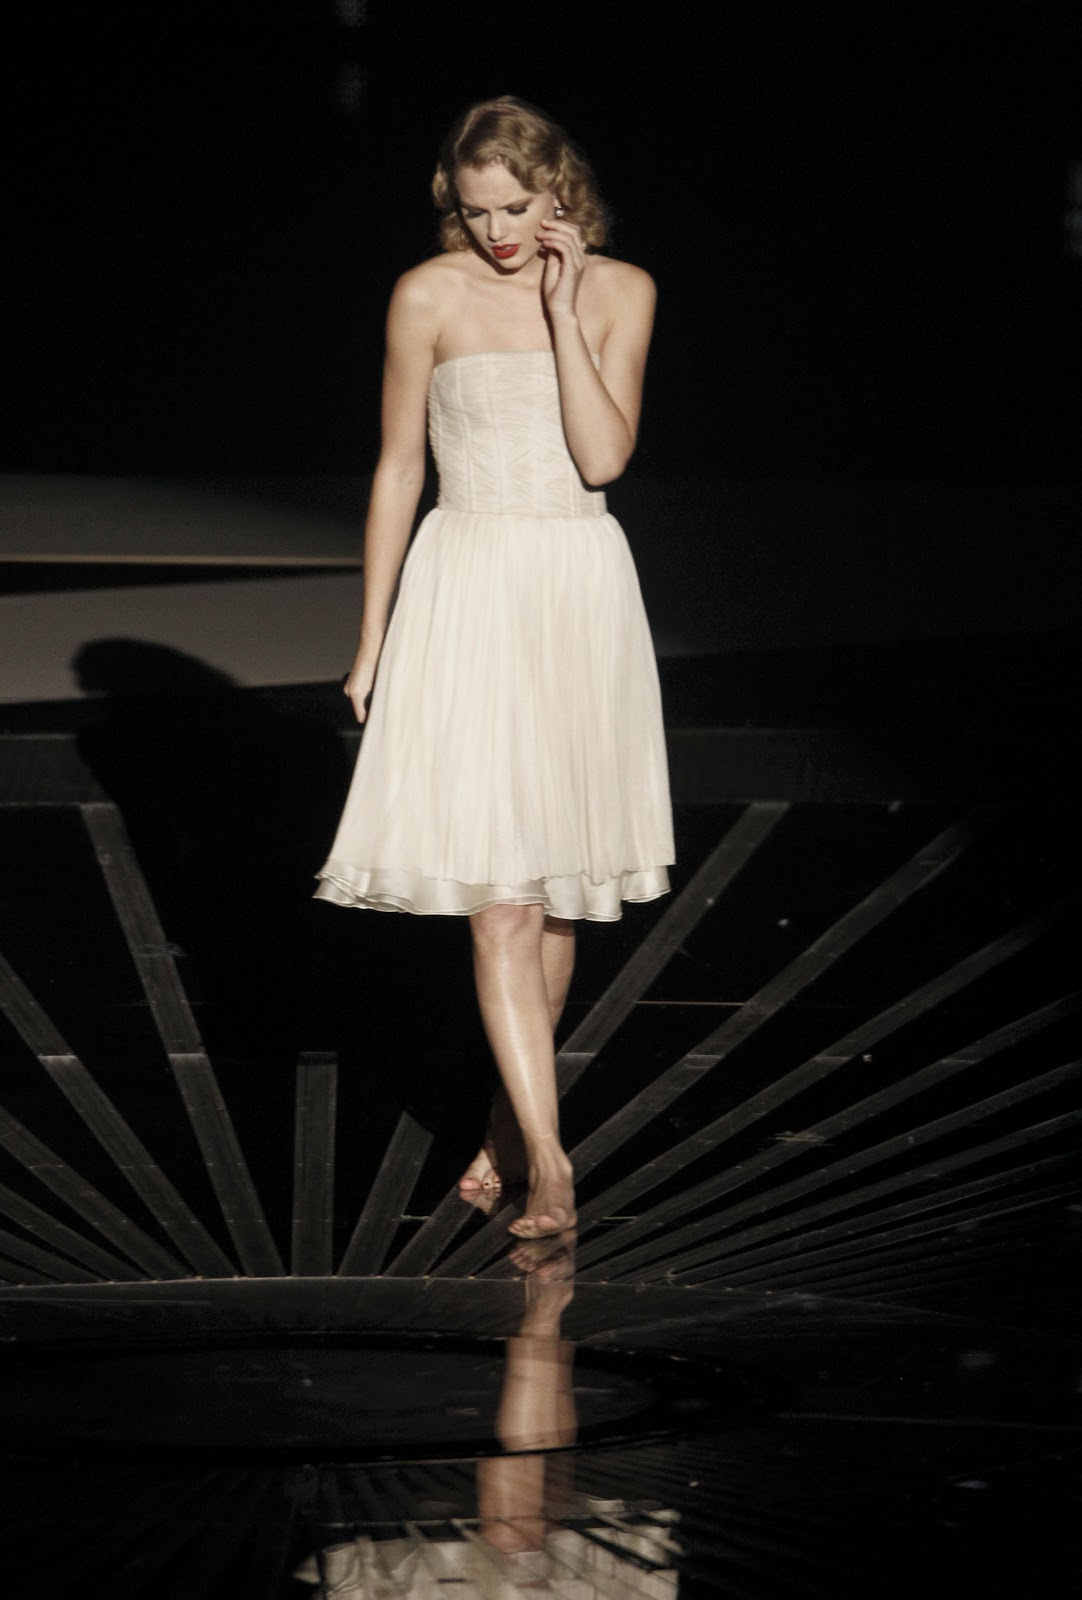 http://4.bp.blogspot.com/-GZB765_cjCg/T1_EAuS_WqI/AAAAAAAAAnc/lJXpxJYWFrI/s1600/Taylor-Swift-Feet-217459.jpg